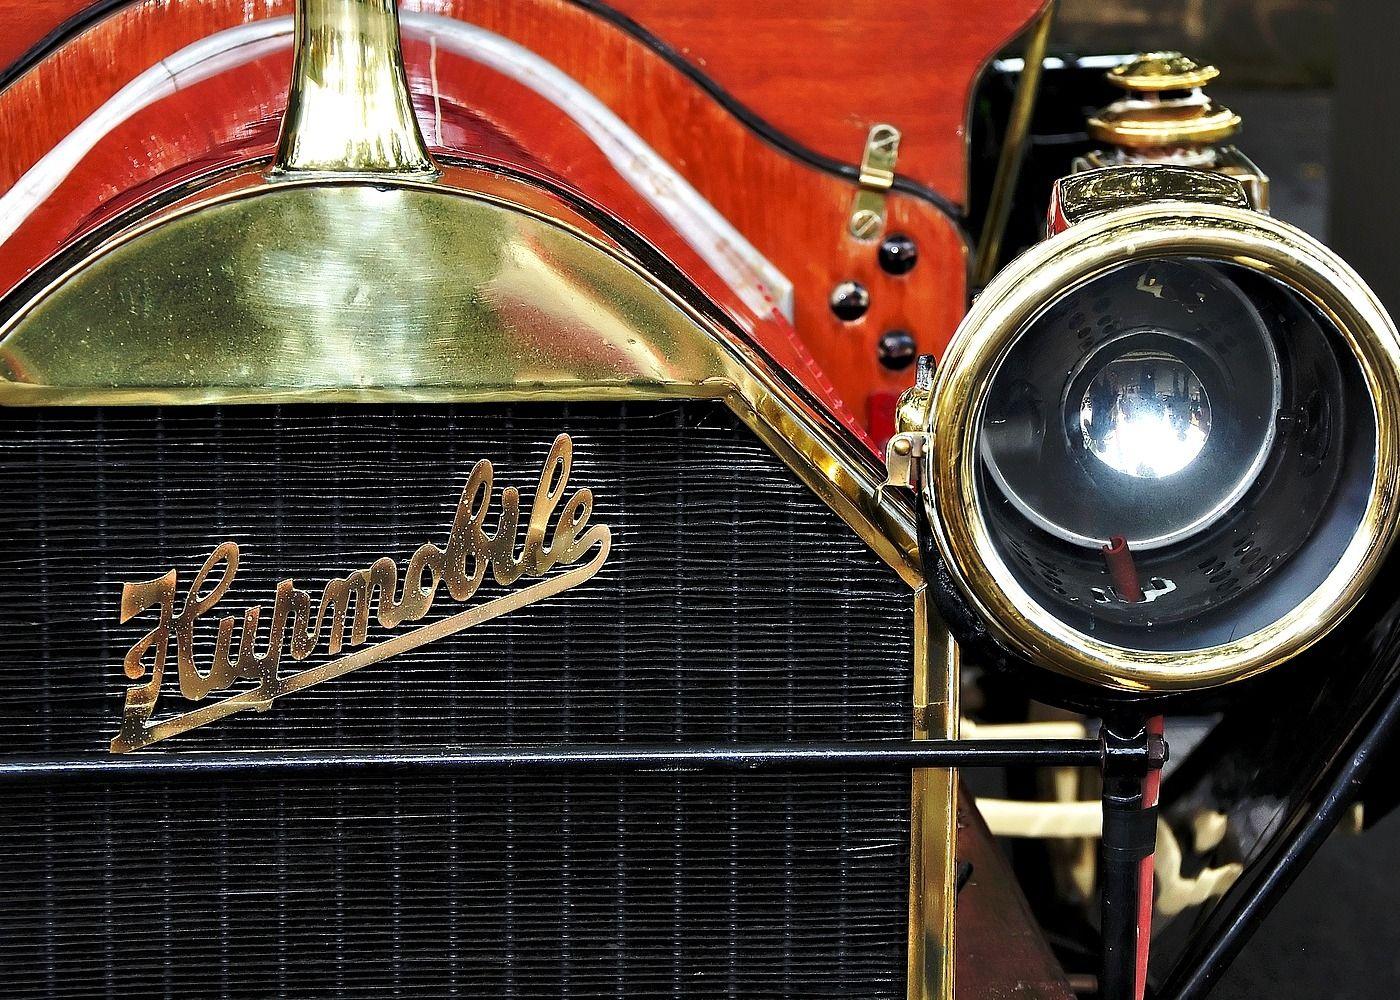 Sold 1910 Hupmobile Model 20 Grill Emblem Classic Cars Vintage Emblems Fine Art America